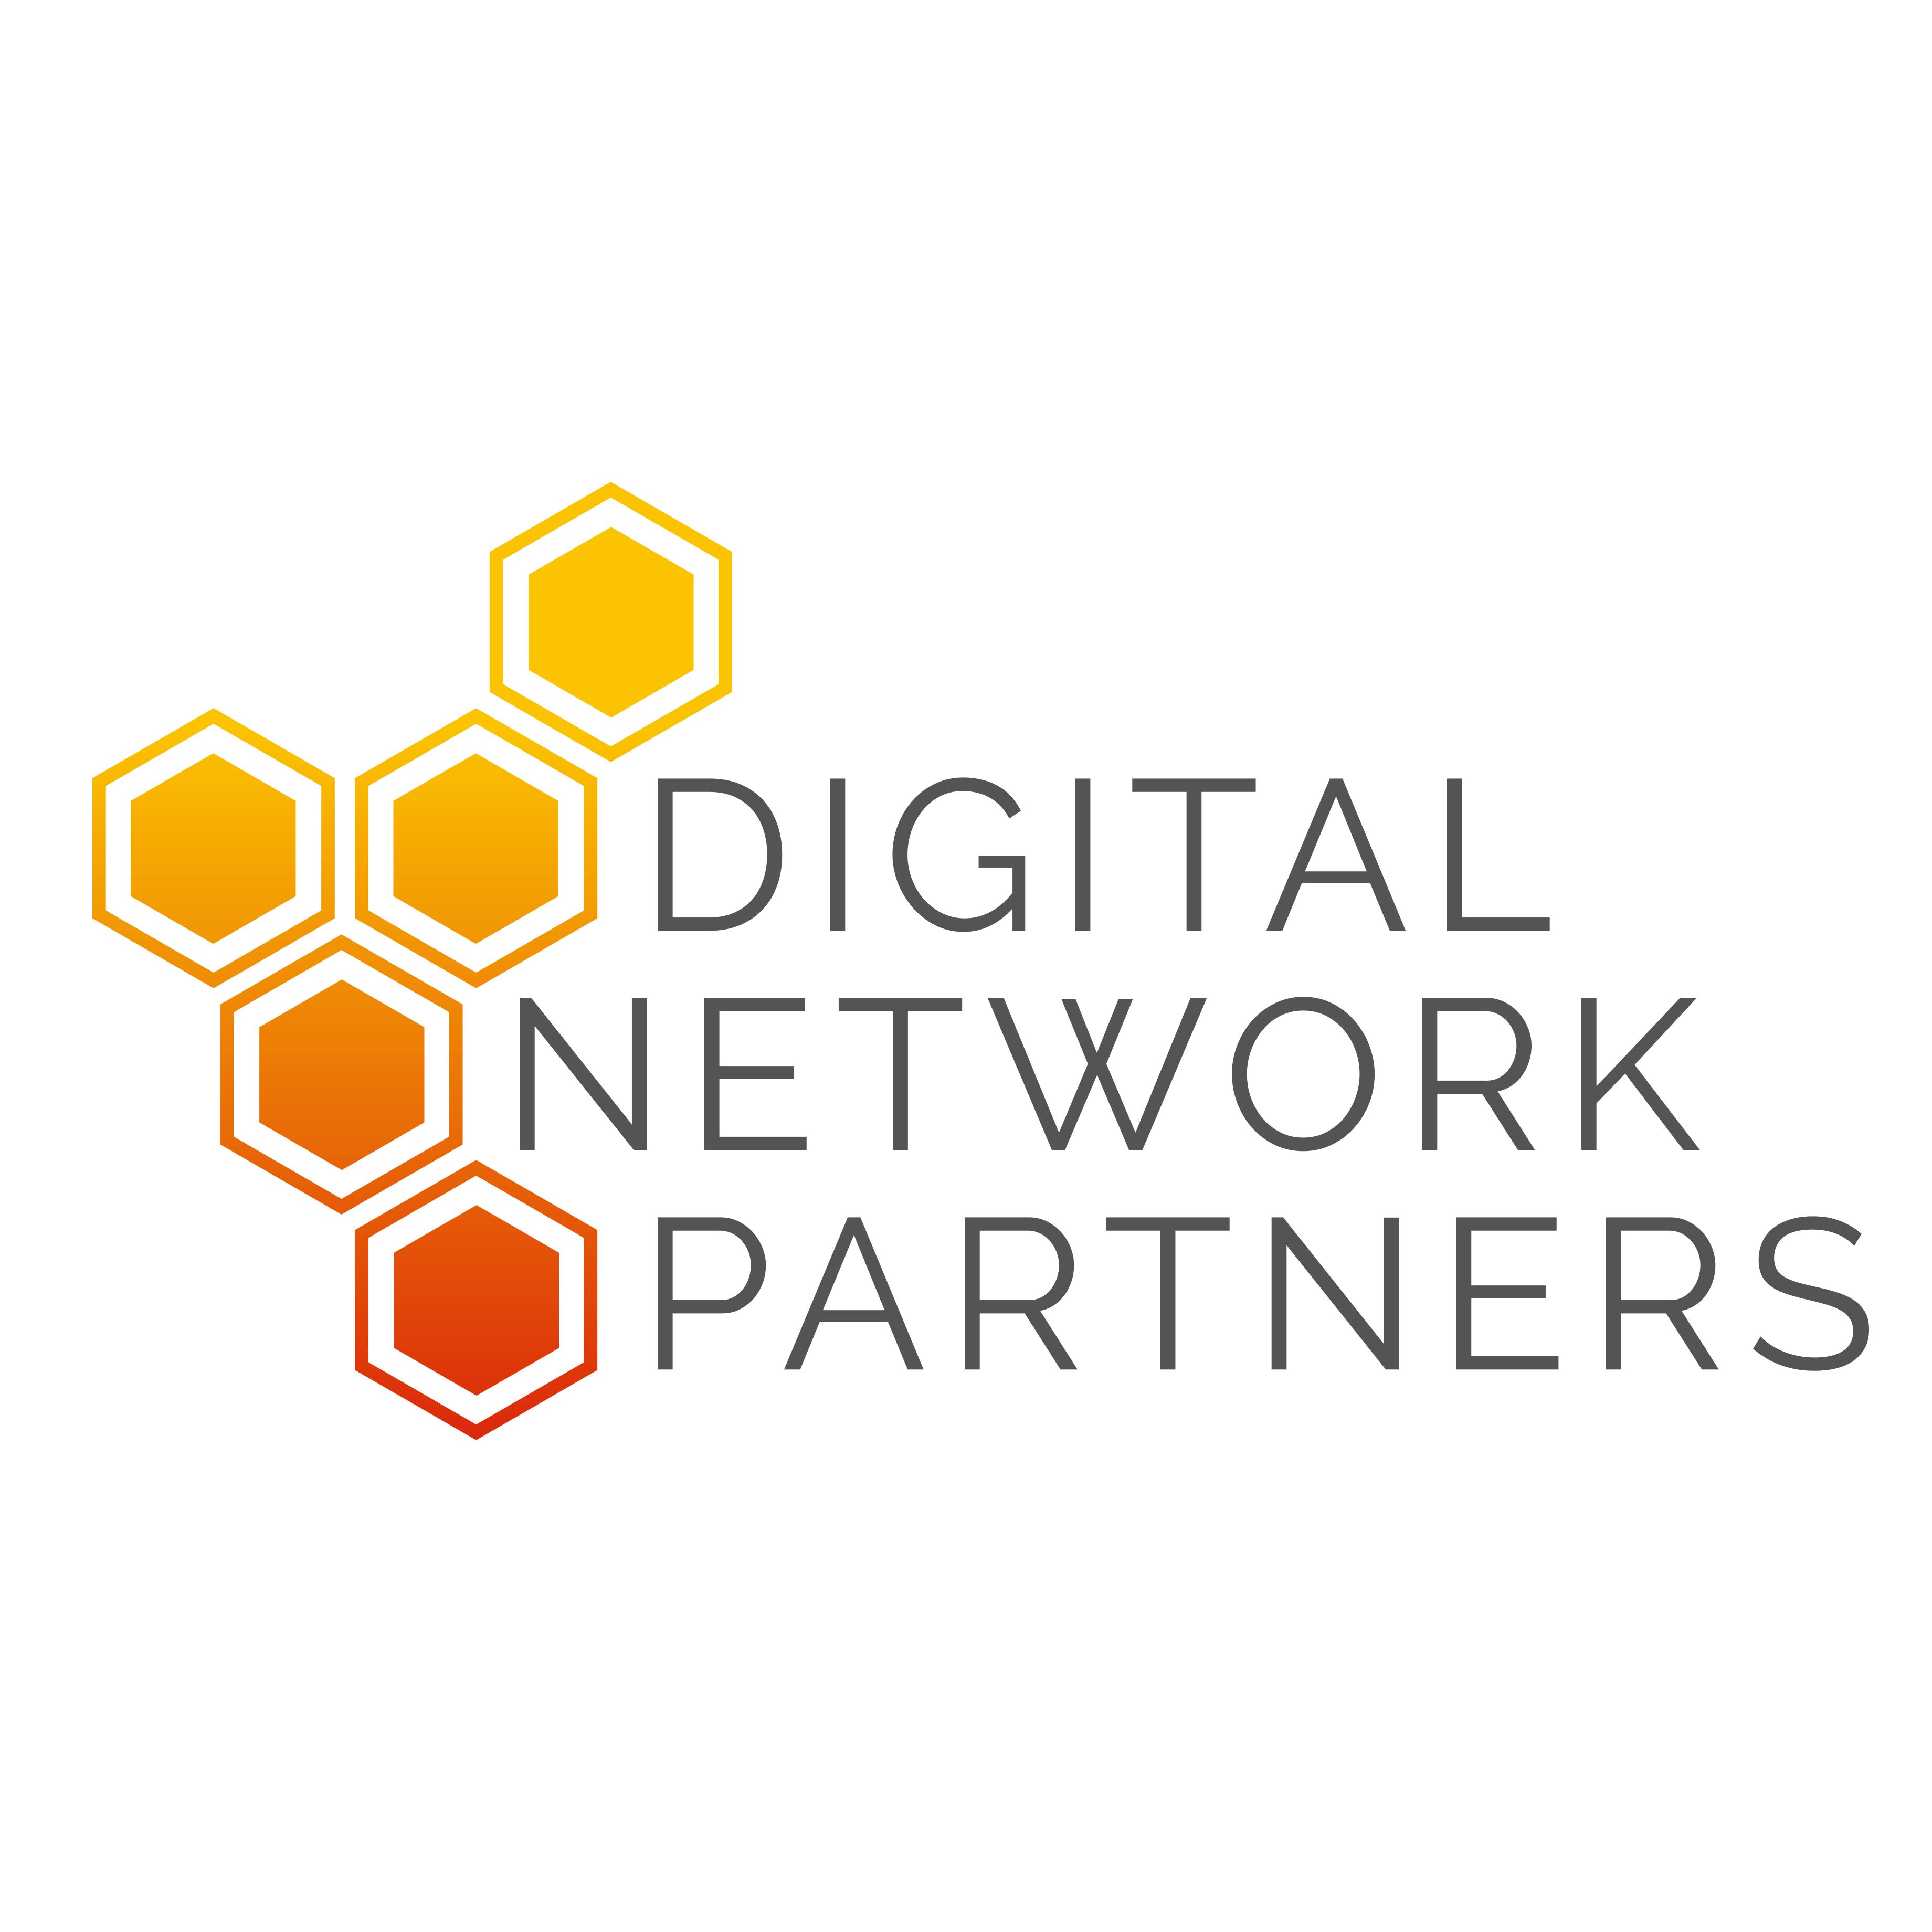 Digital Network Partners